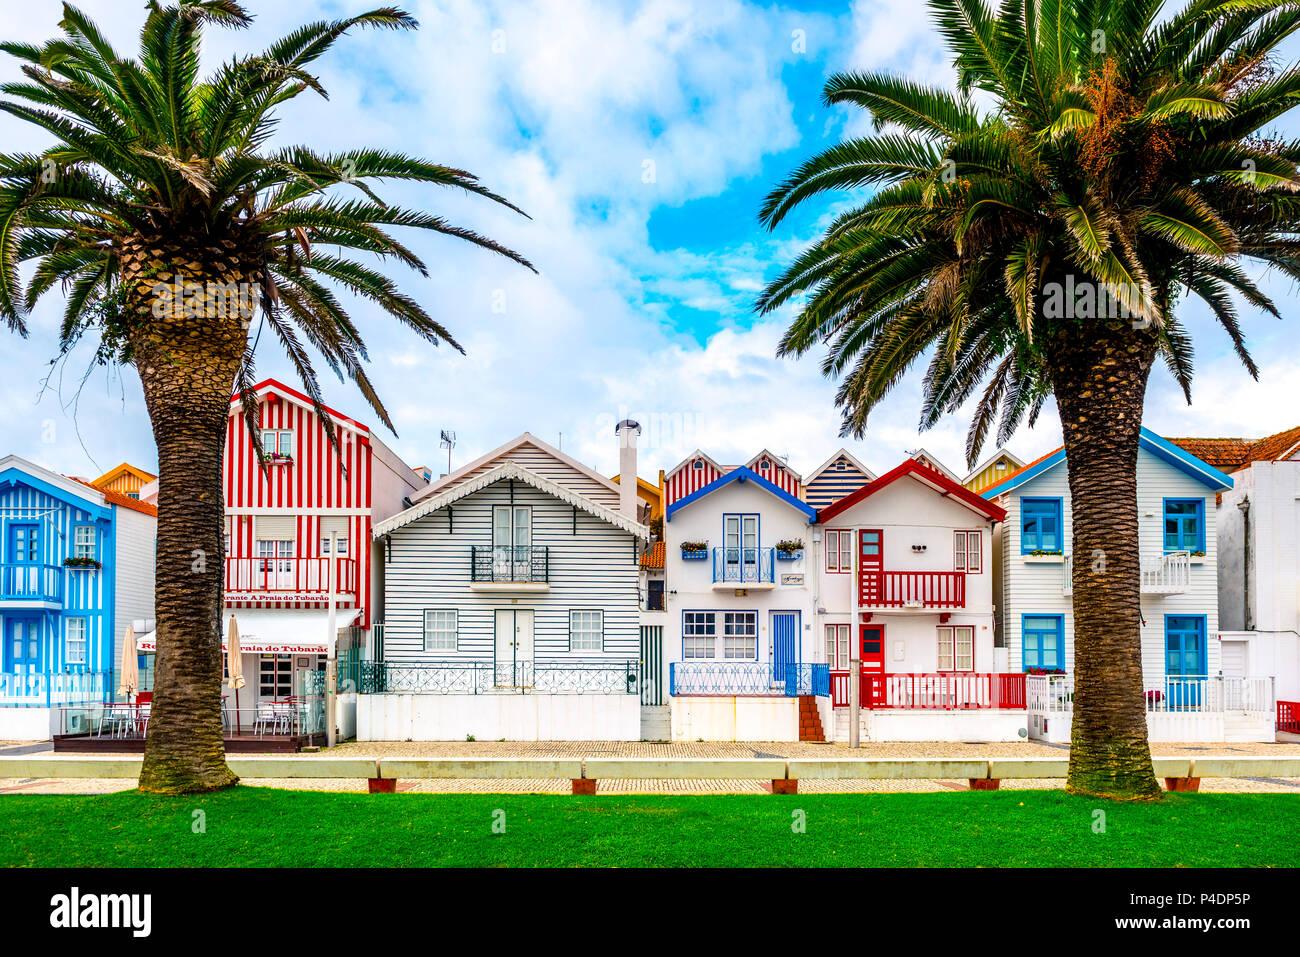 Europa, Portugal, Aveiro, Costa Nova, bunt, Häuser - Stock Image